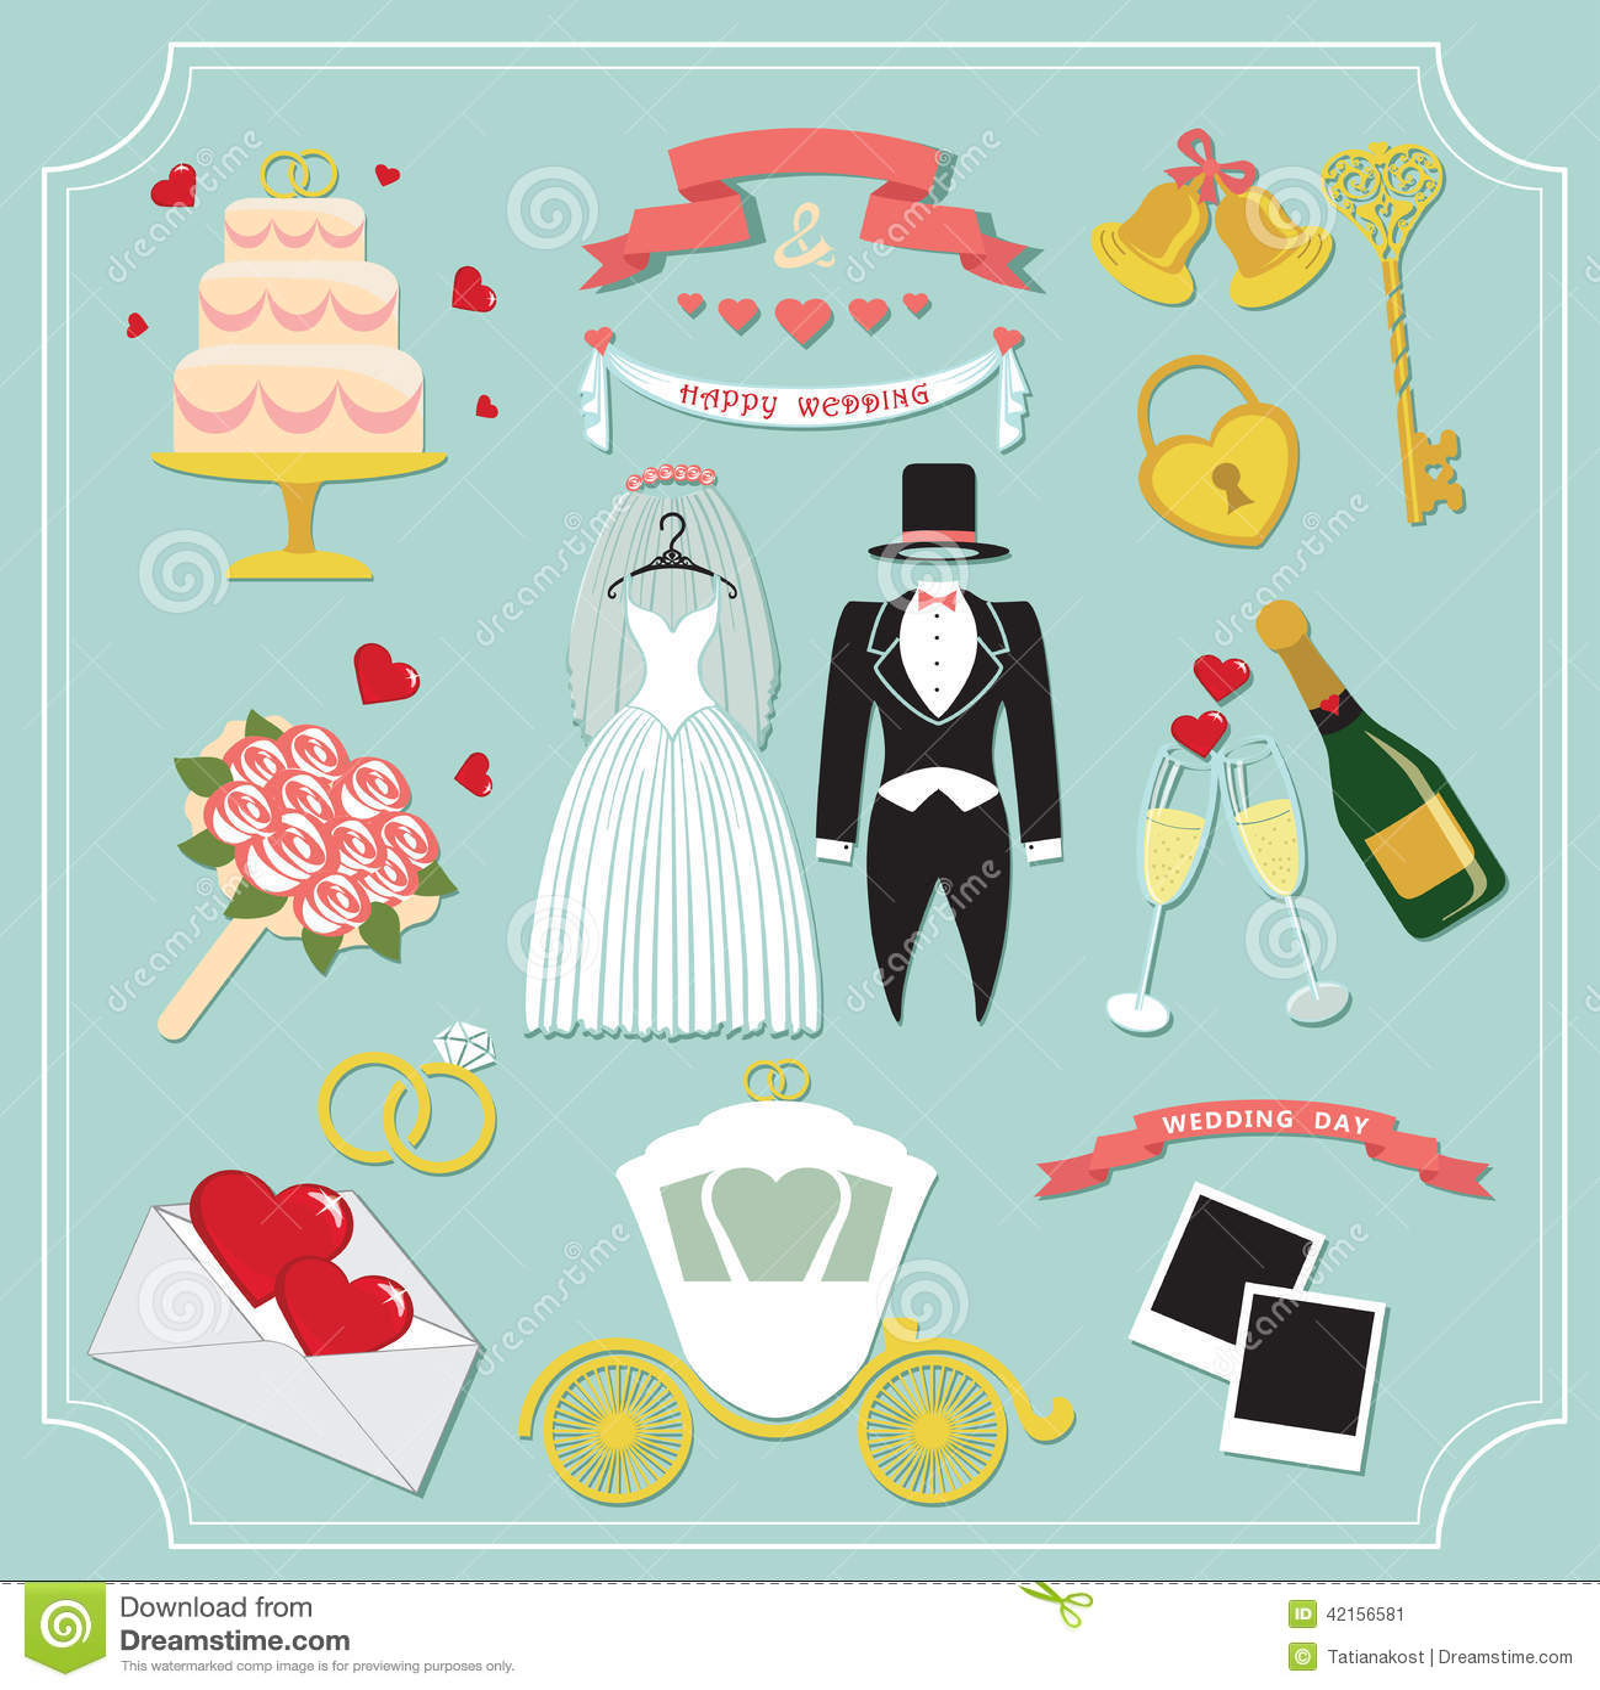 Vintage Set For Wedding Invitation Cute Design Elements Stock